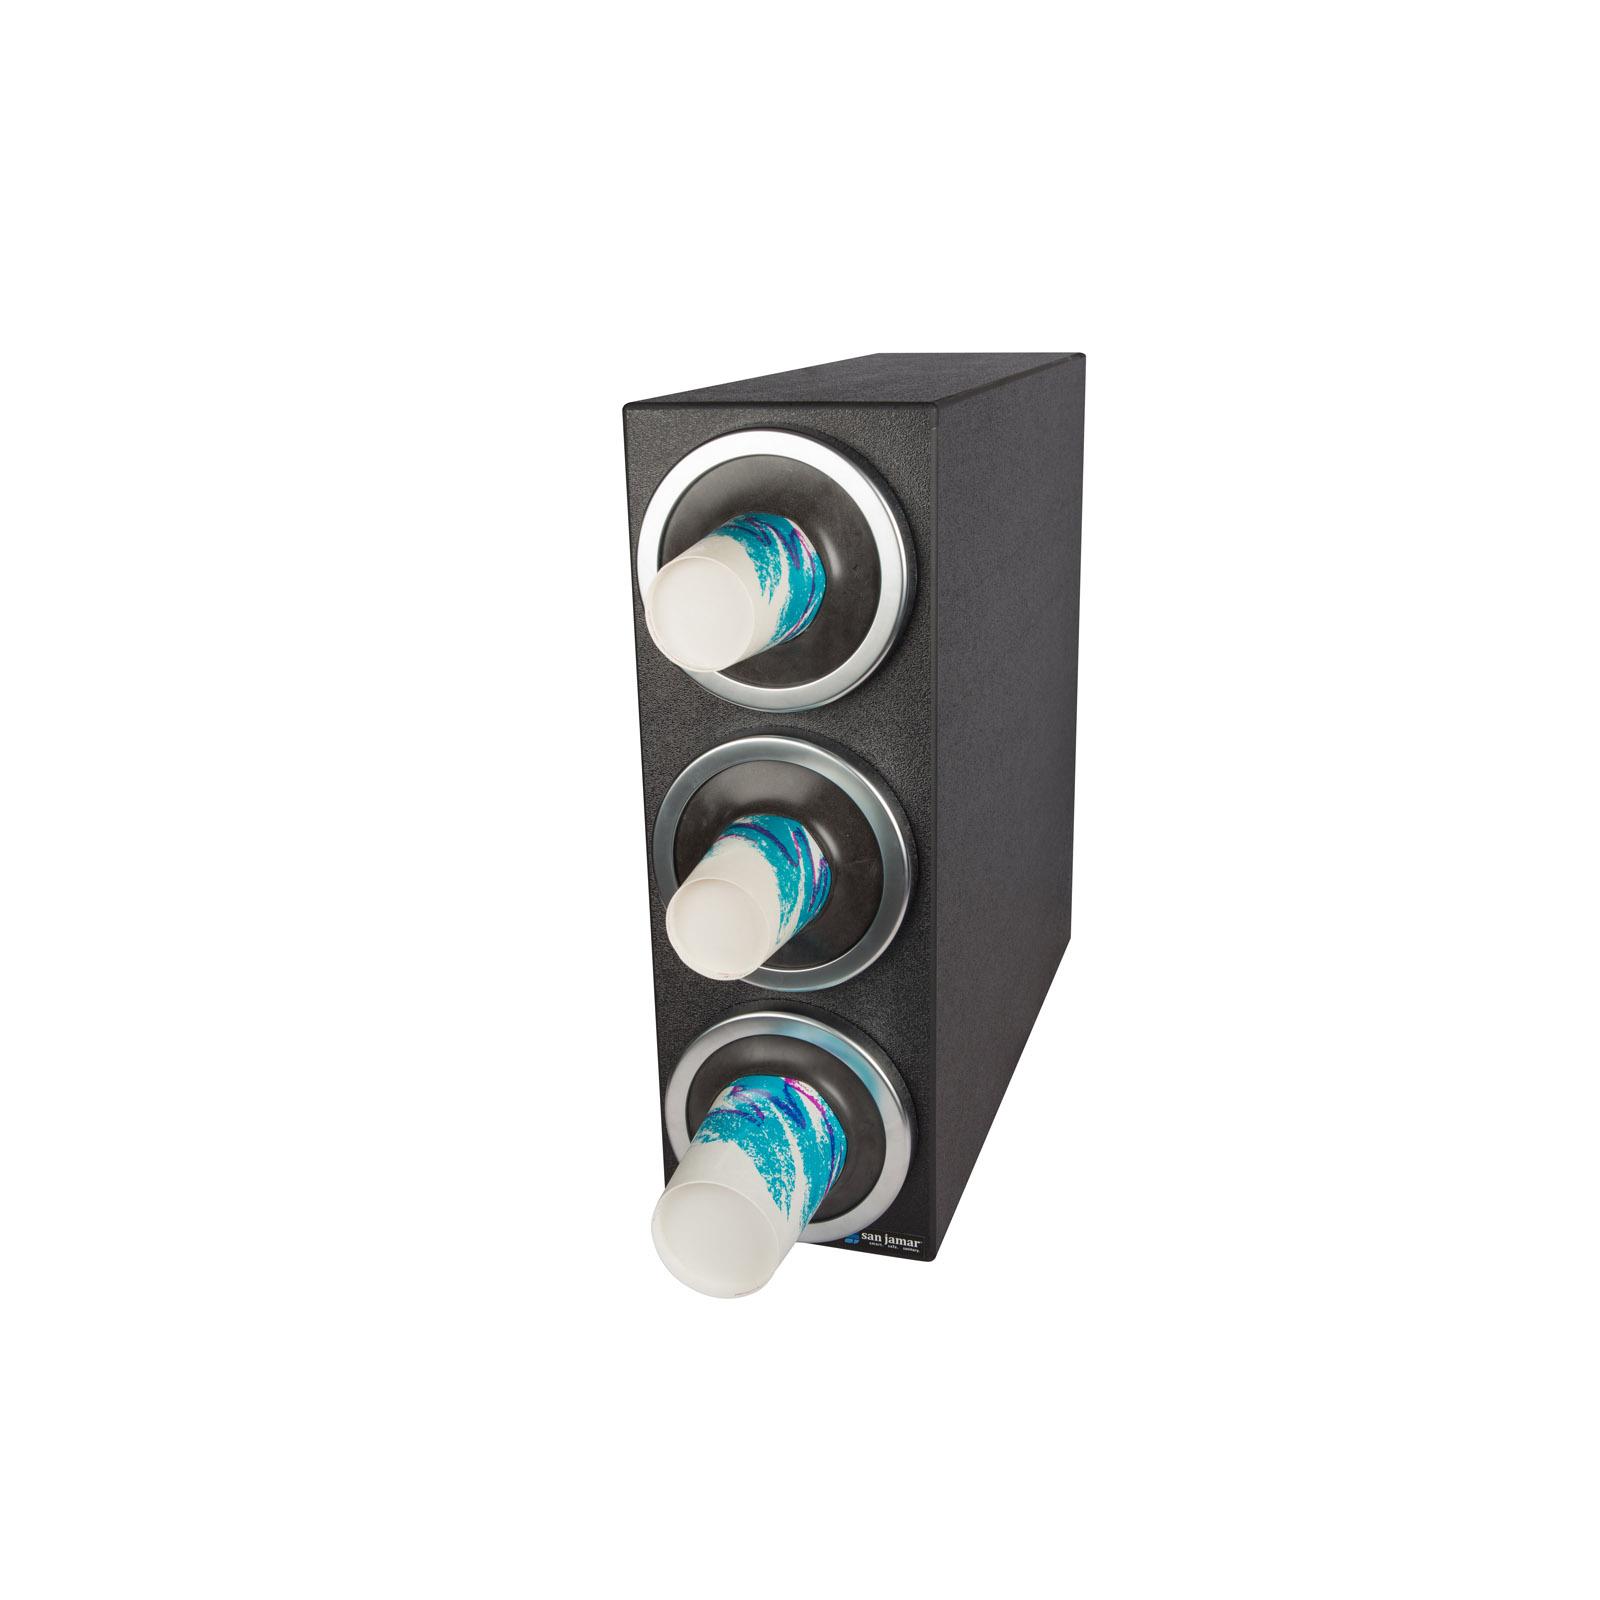 San Jamar C2903 cup dispensers, countertop